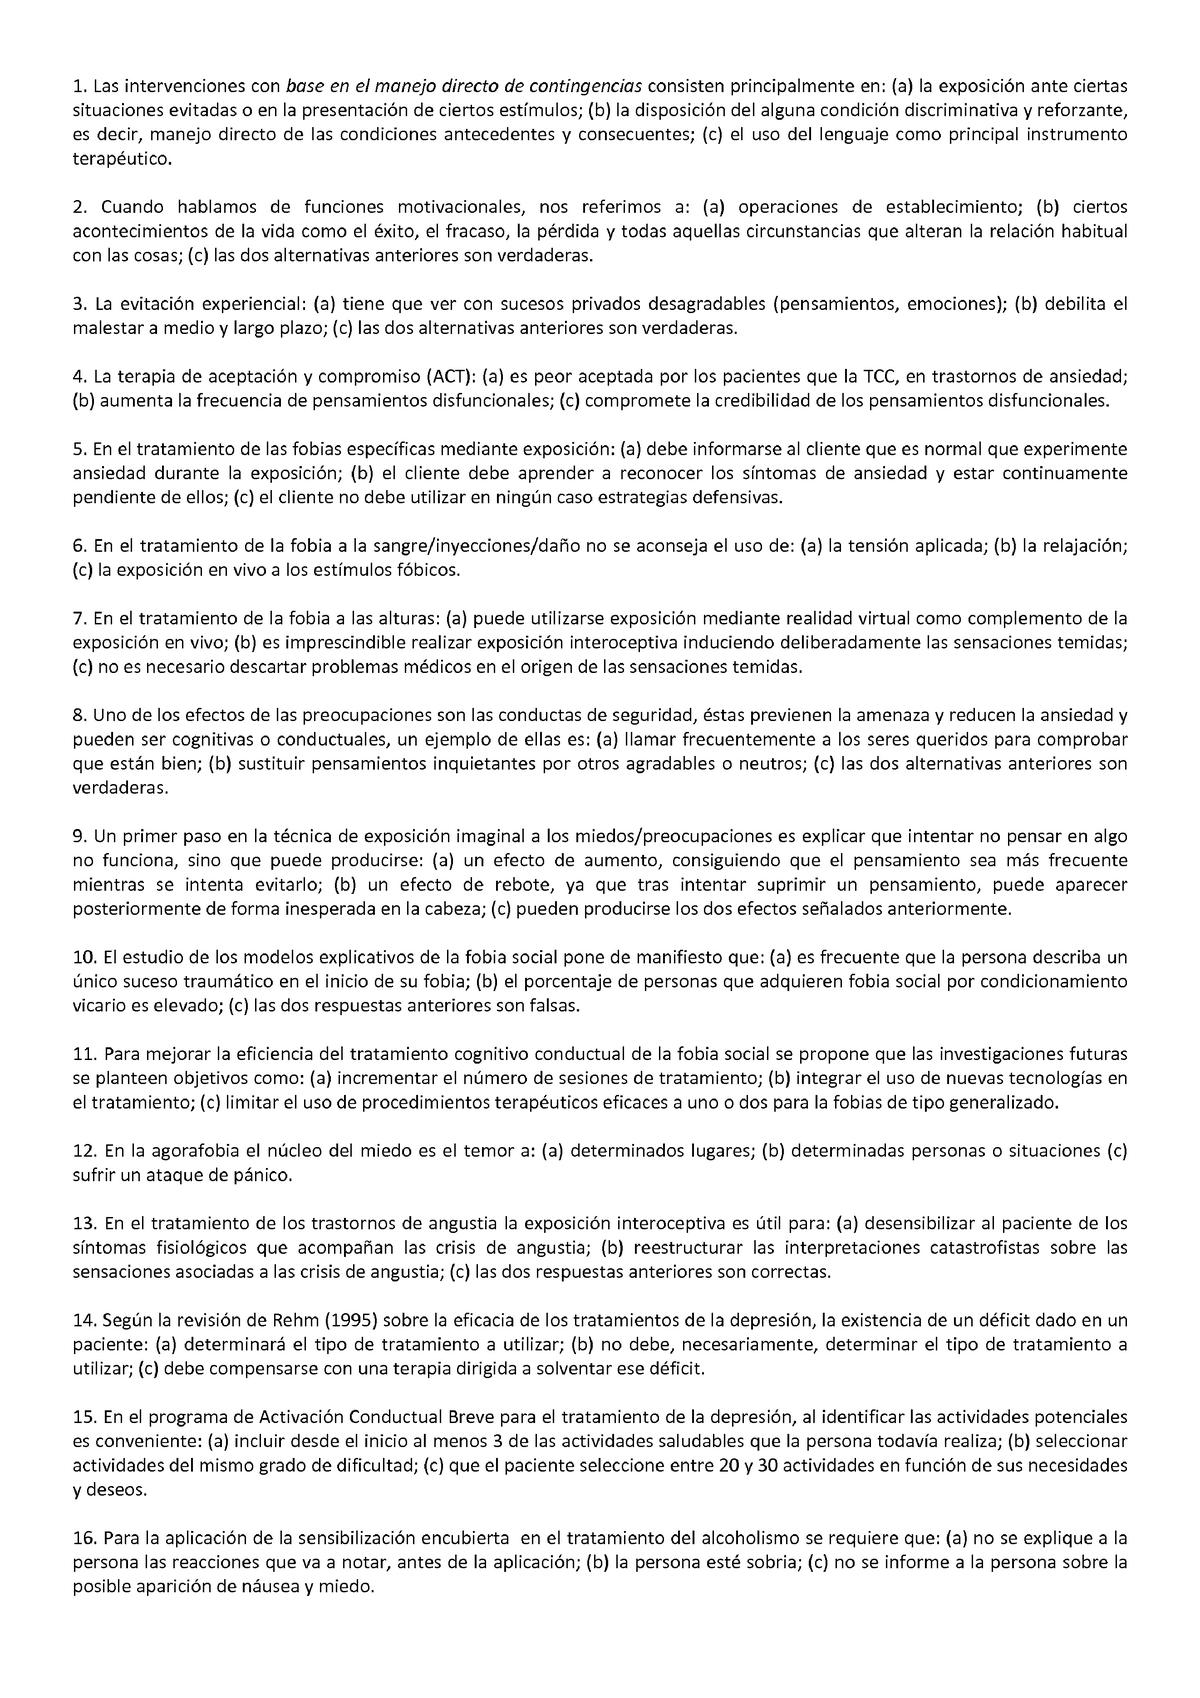 Exam 15 September 2014 Questions T336 Udelar Studocu